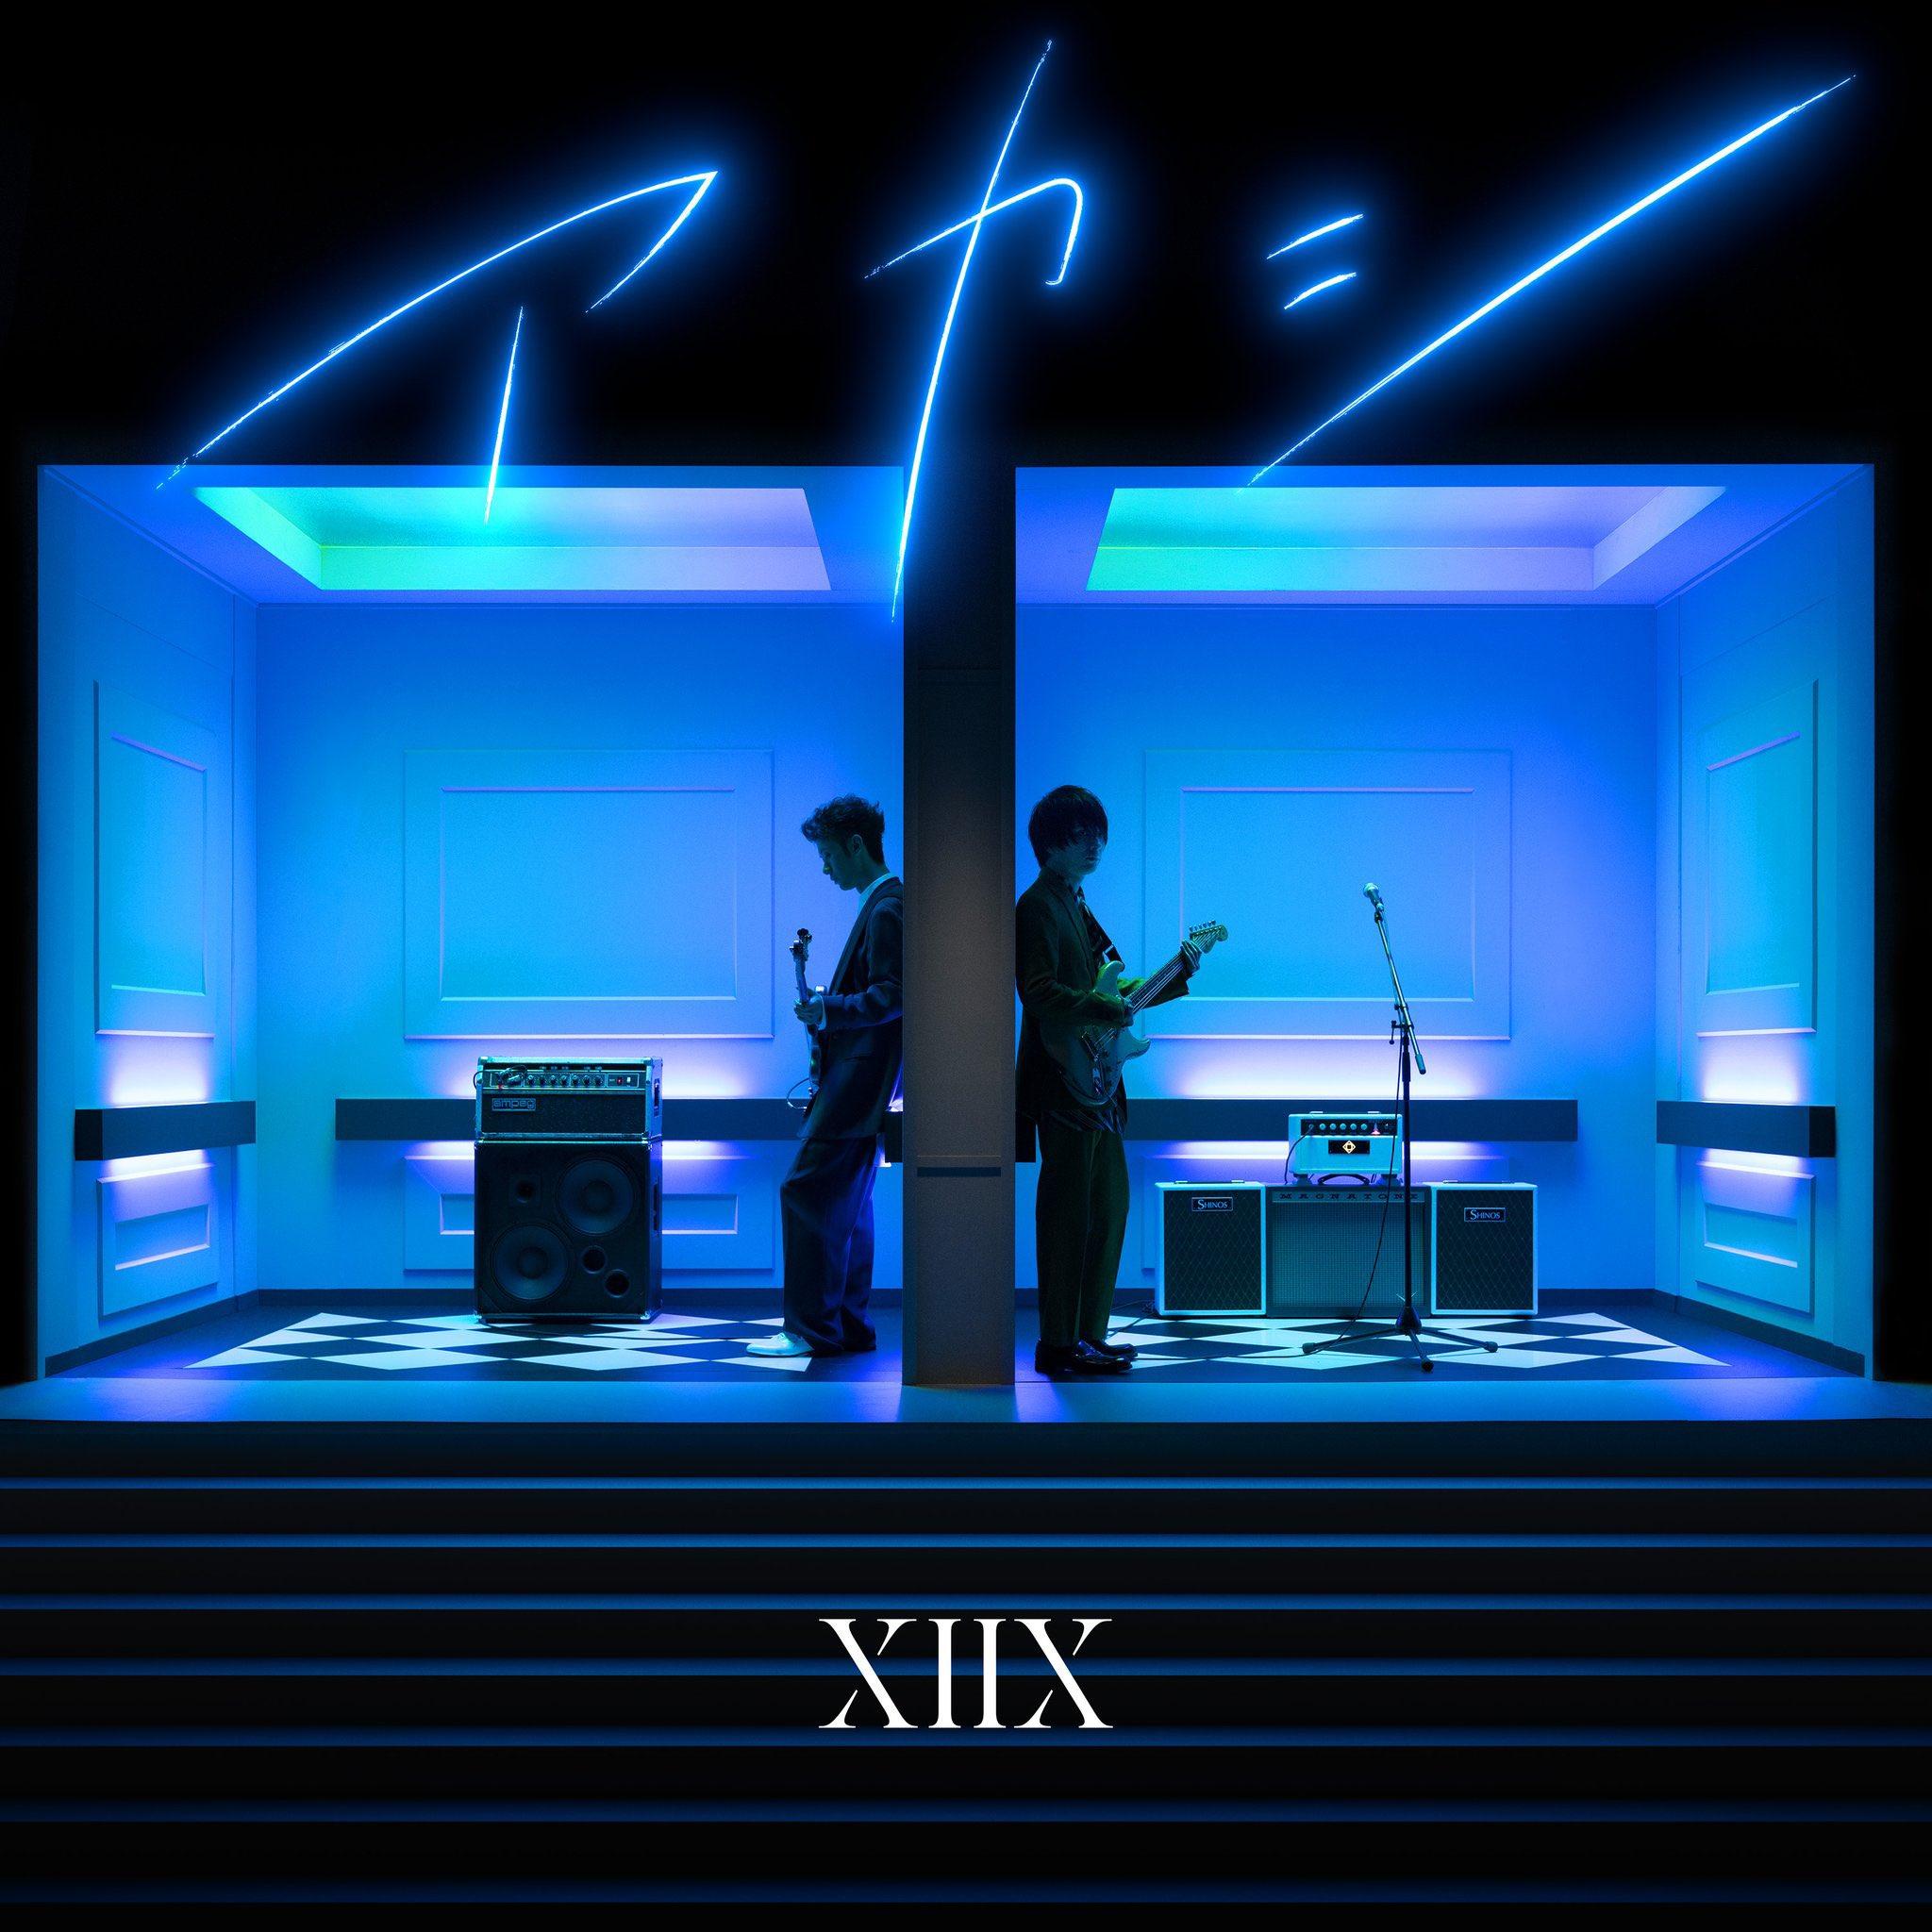 XIIX - アカシ